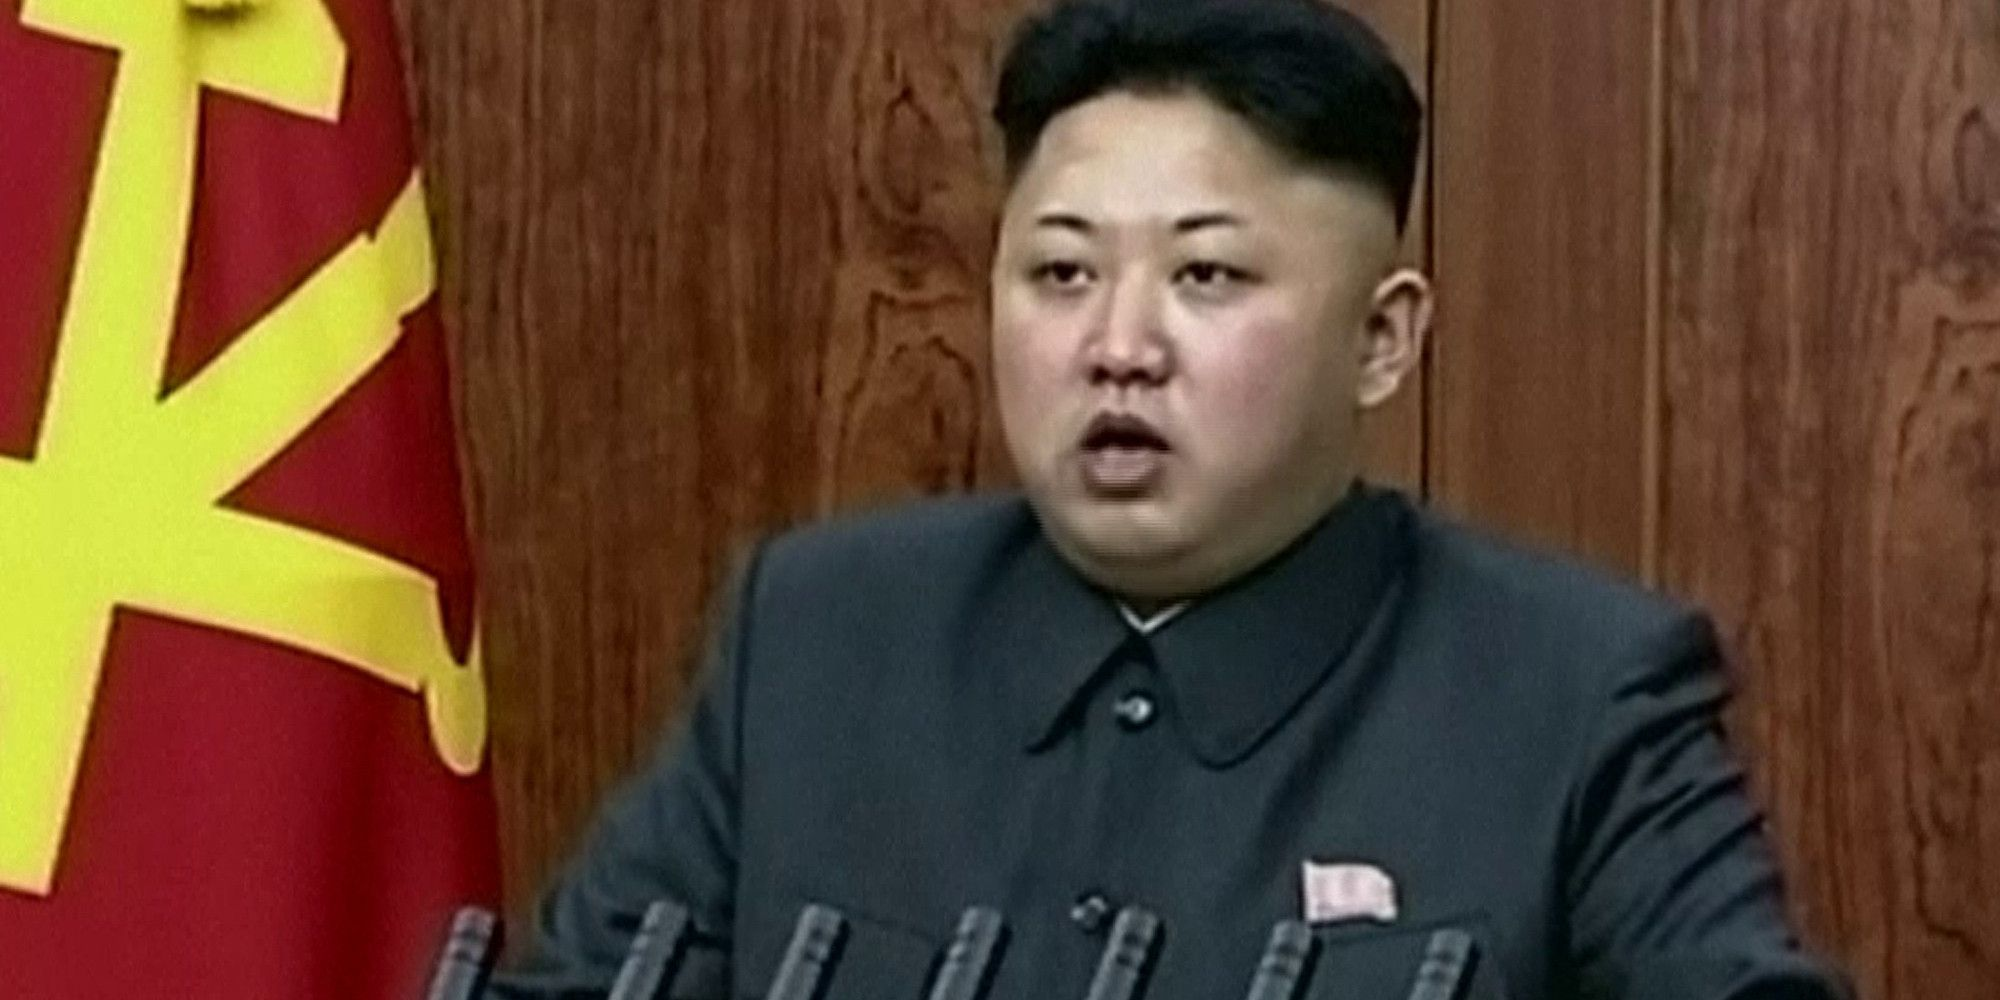 North Korea may receive US response in retaliation for Sony hack